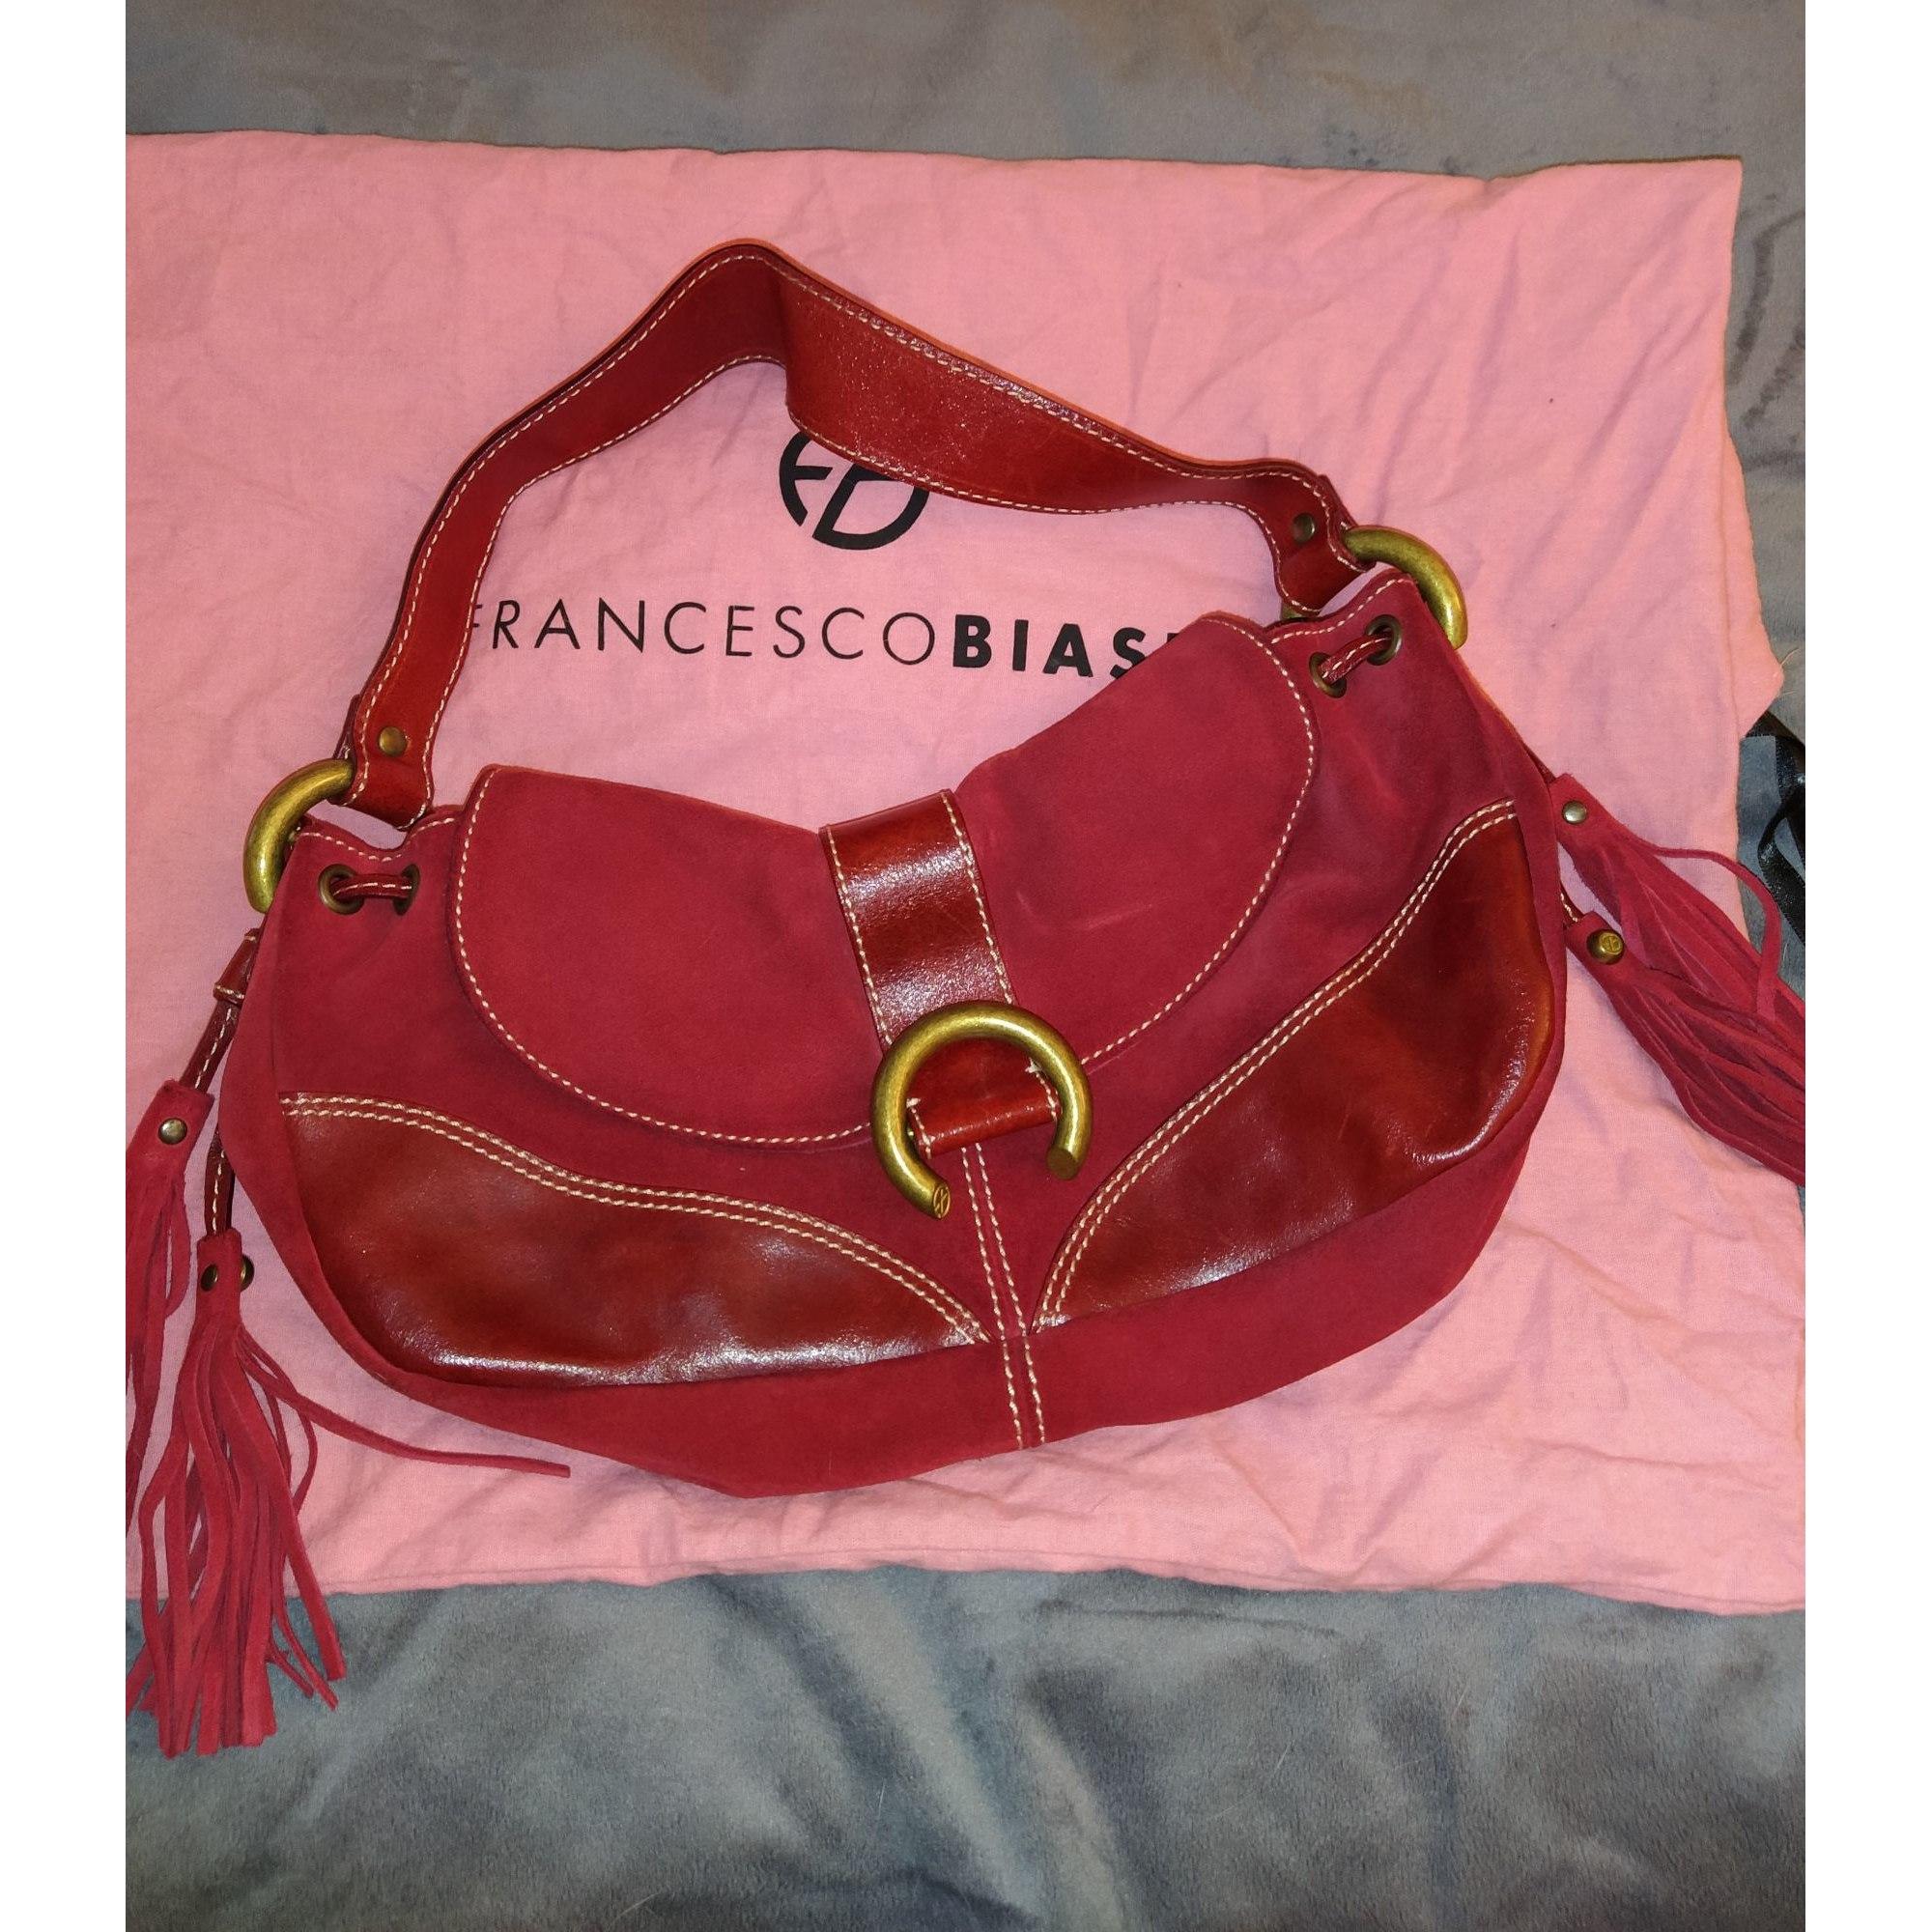 Lederhandtasche FRANCESCO BIASIA Rot, bordeauxrot